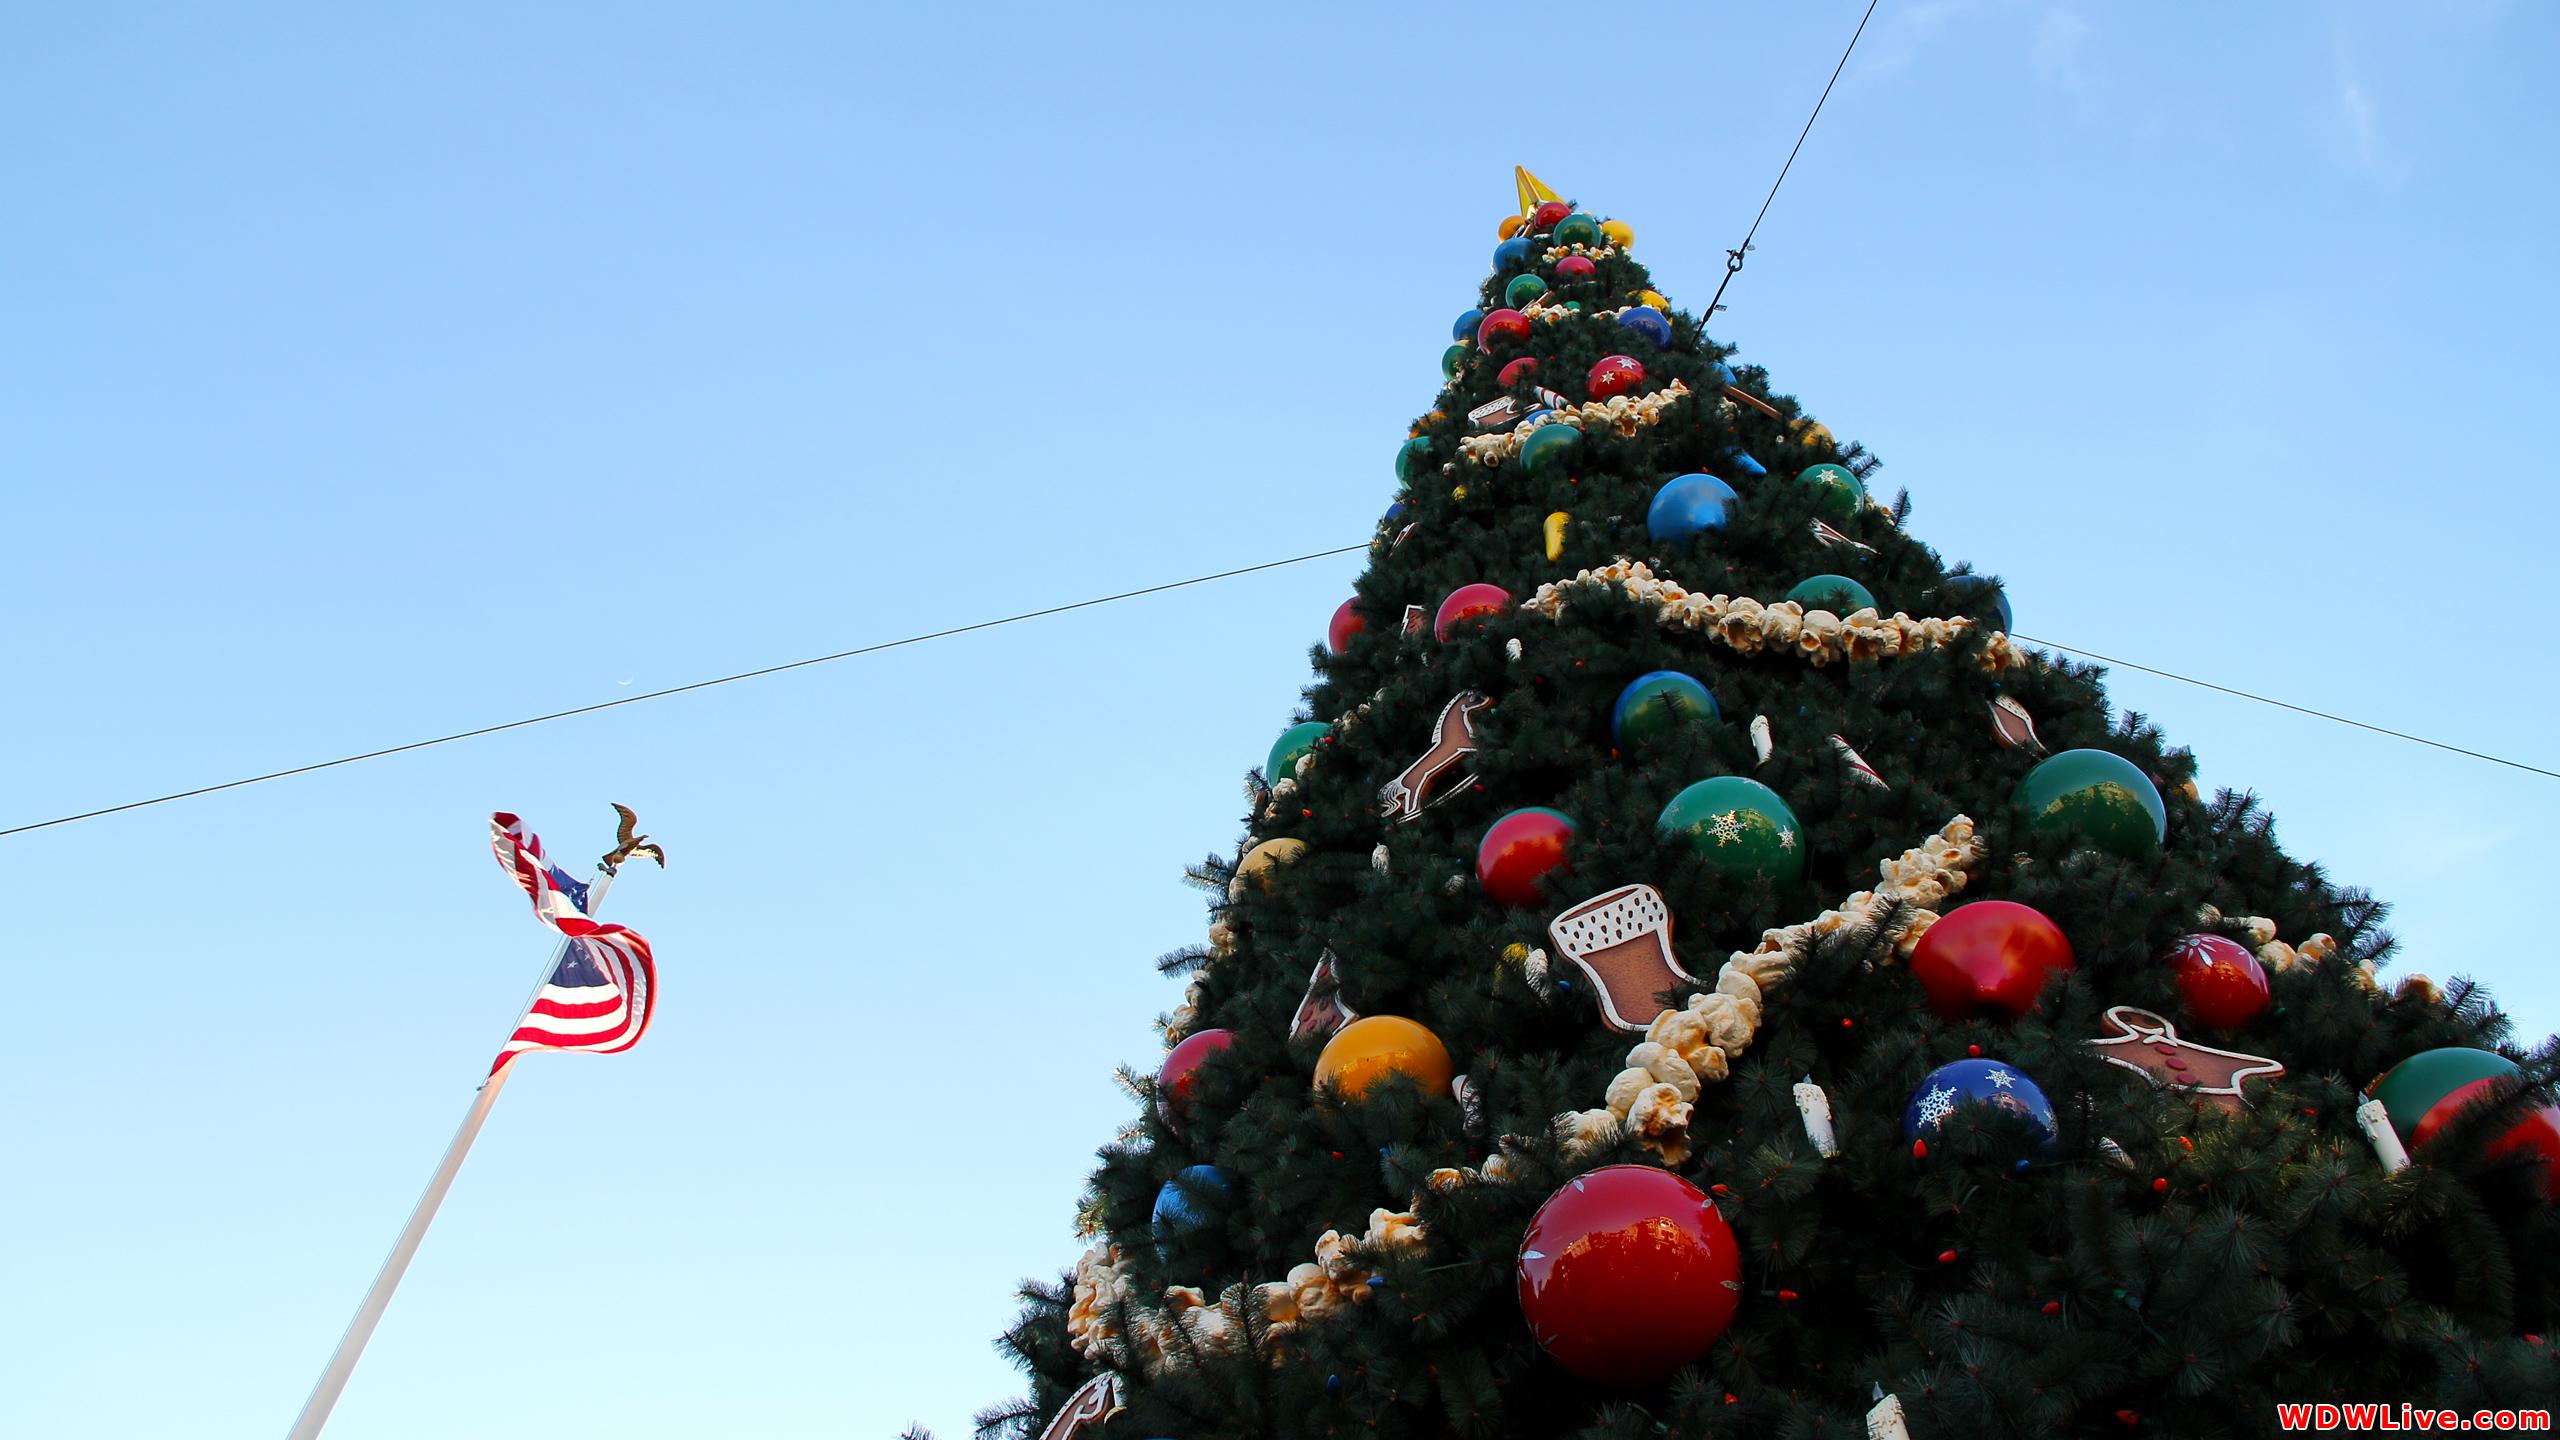 Christmas Decorations Magic Kingdom Christmas tree and the flag of 2560x1440